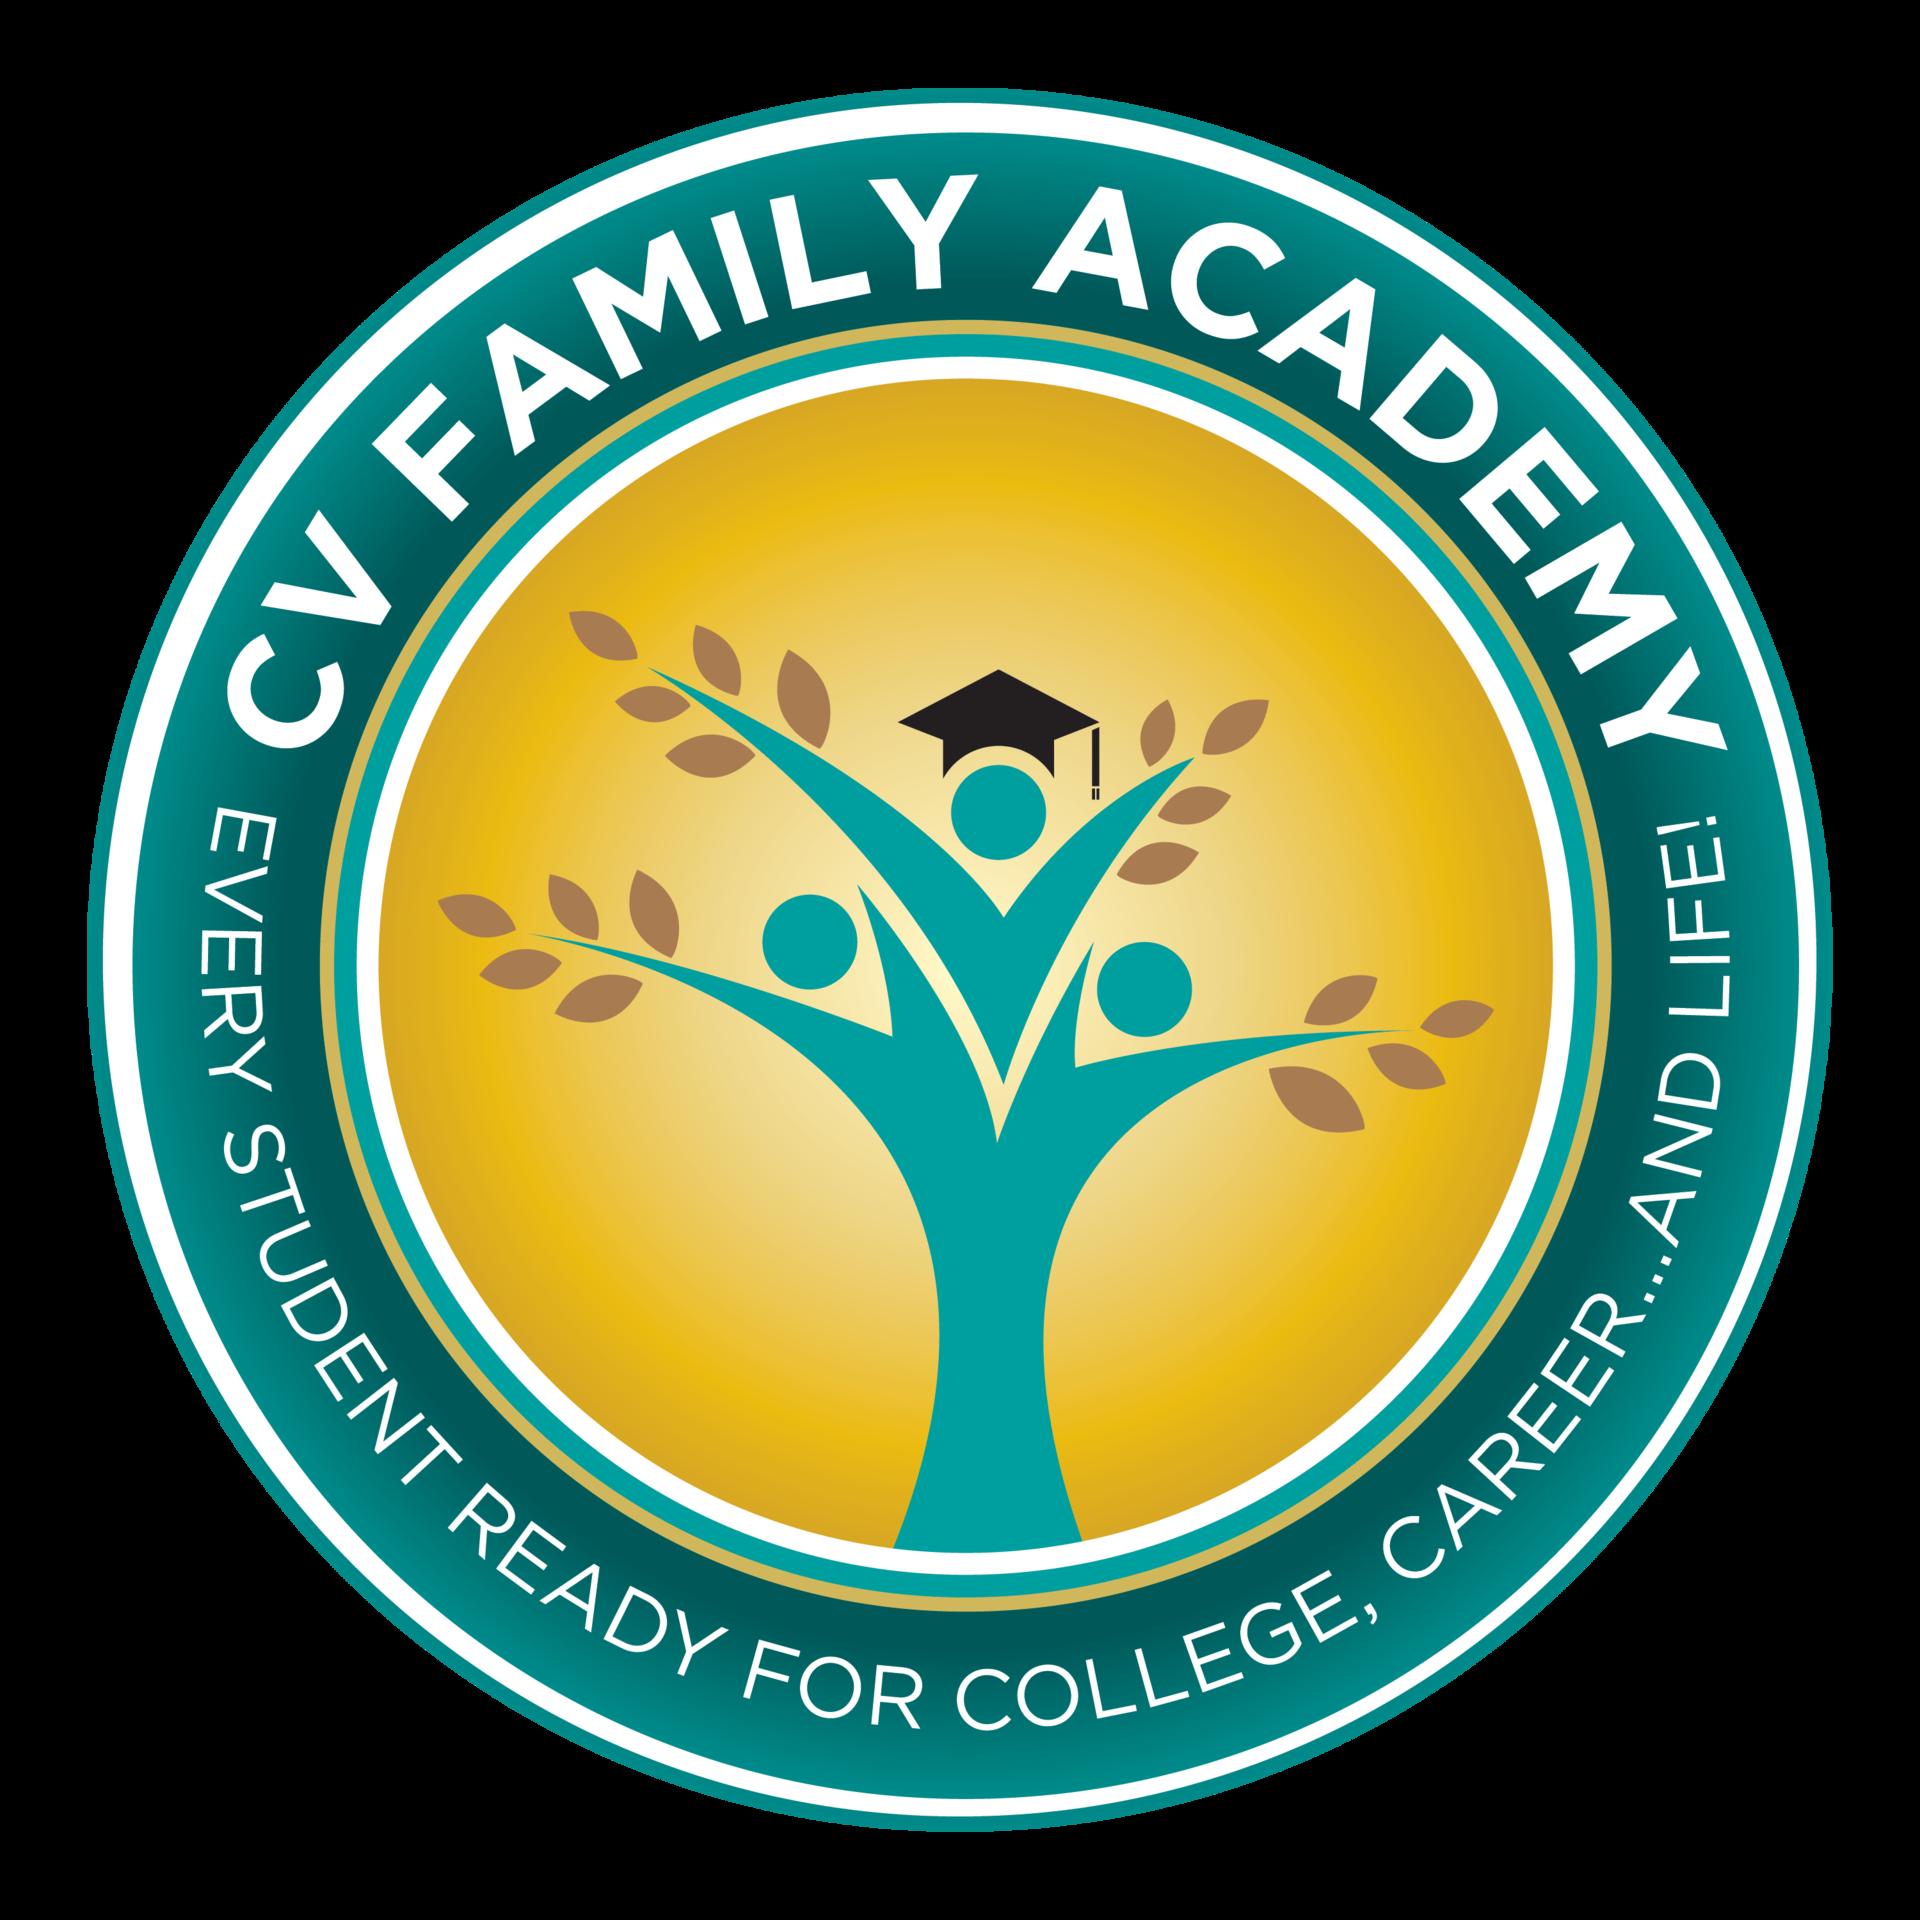 CV Family Academy Passport - Log Here